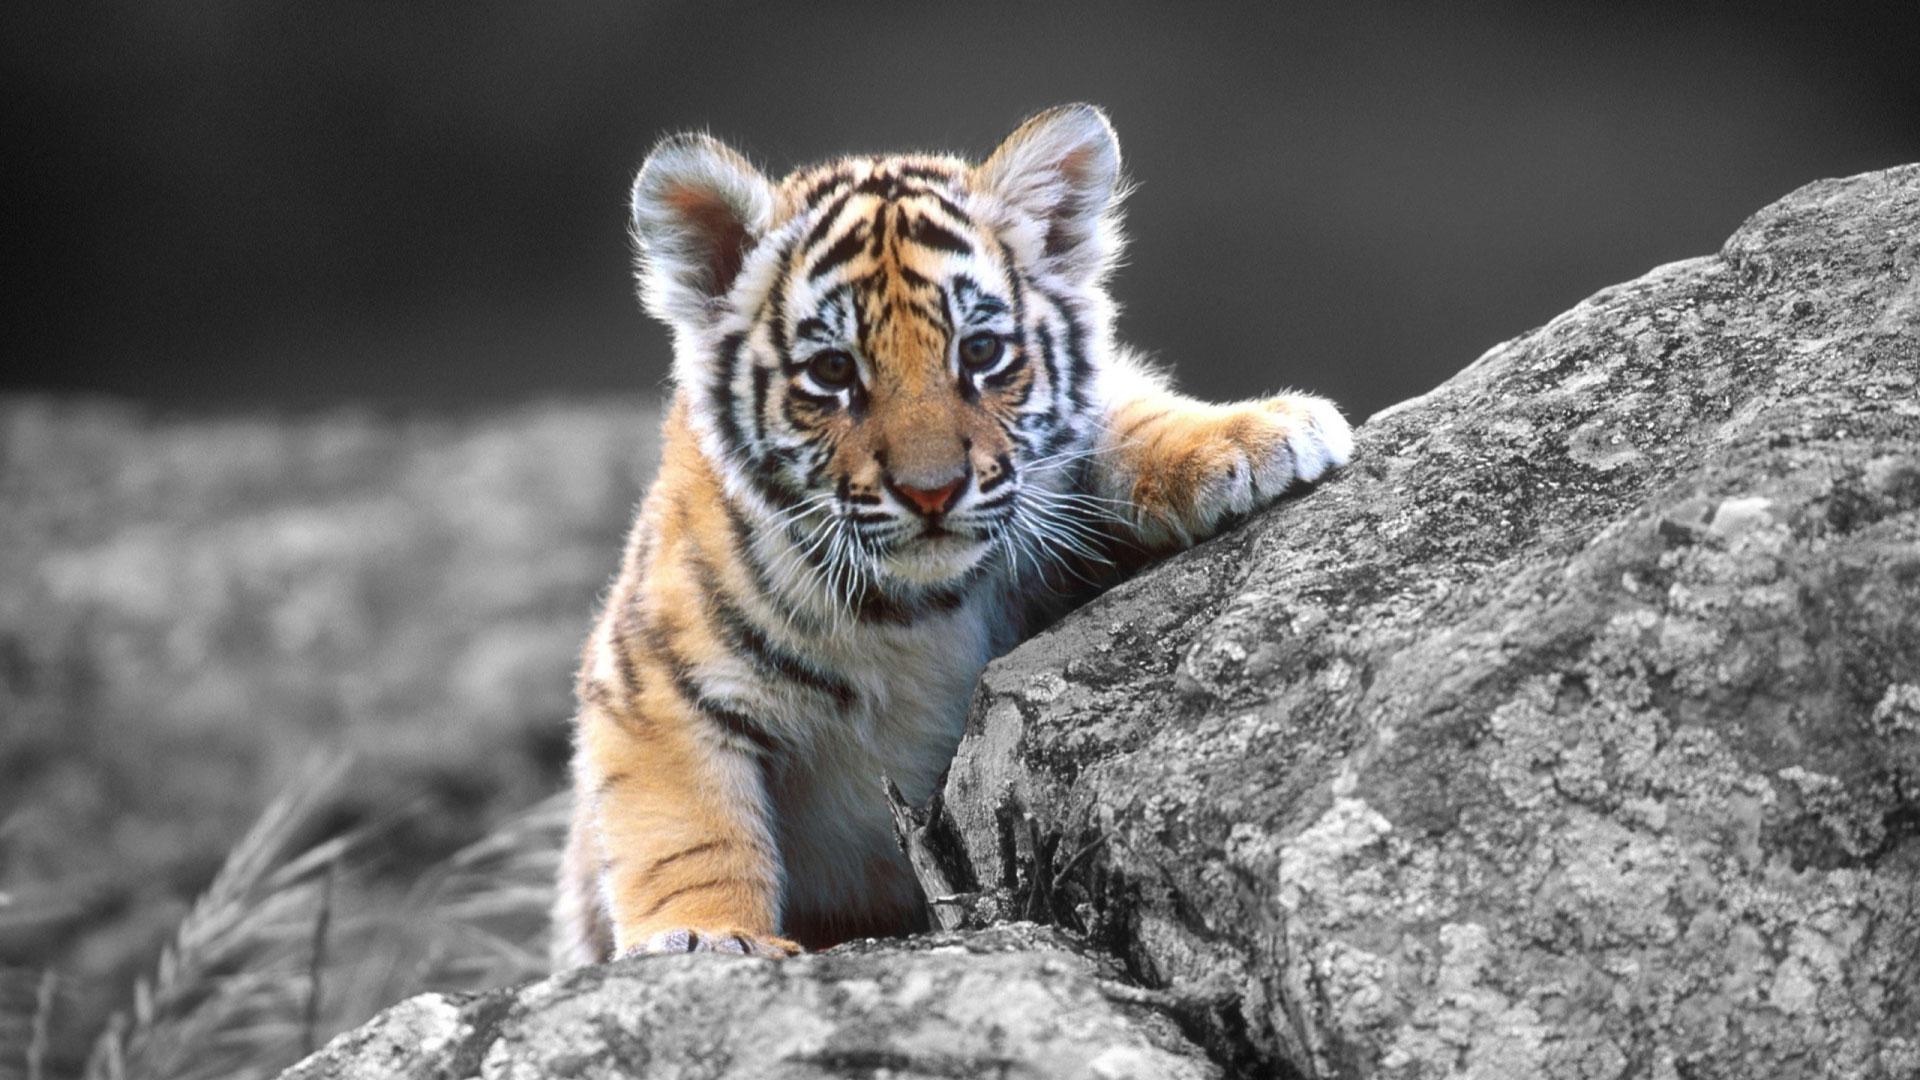 1920x1080px download free tiger wallpapers hd wallpapersafari